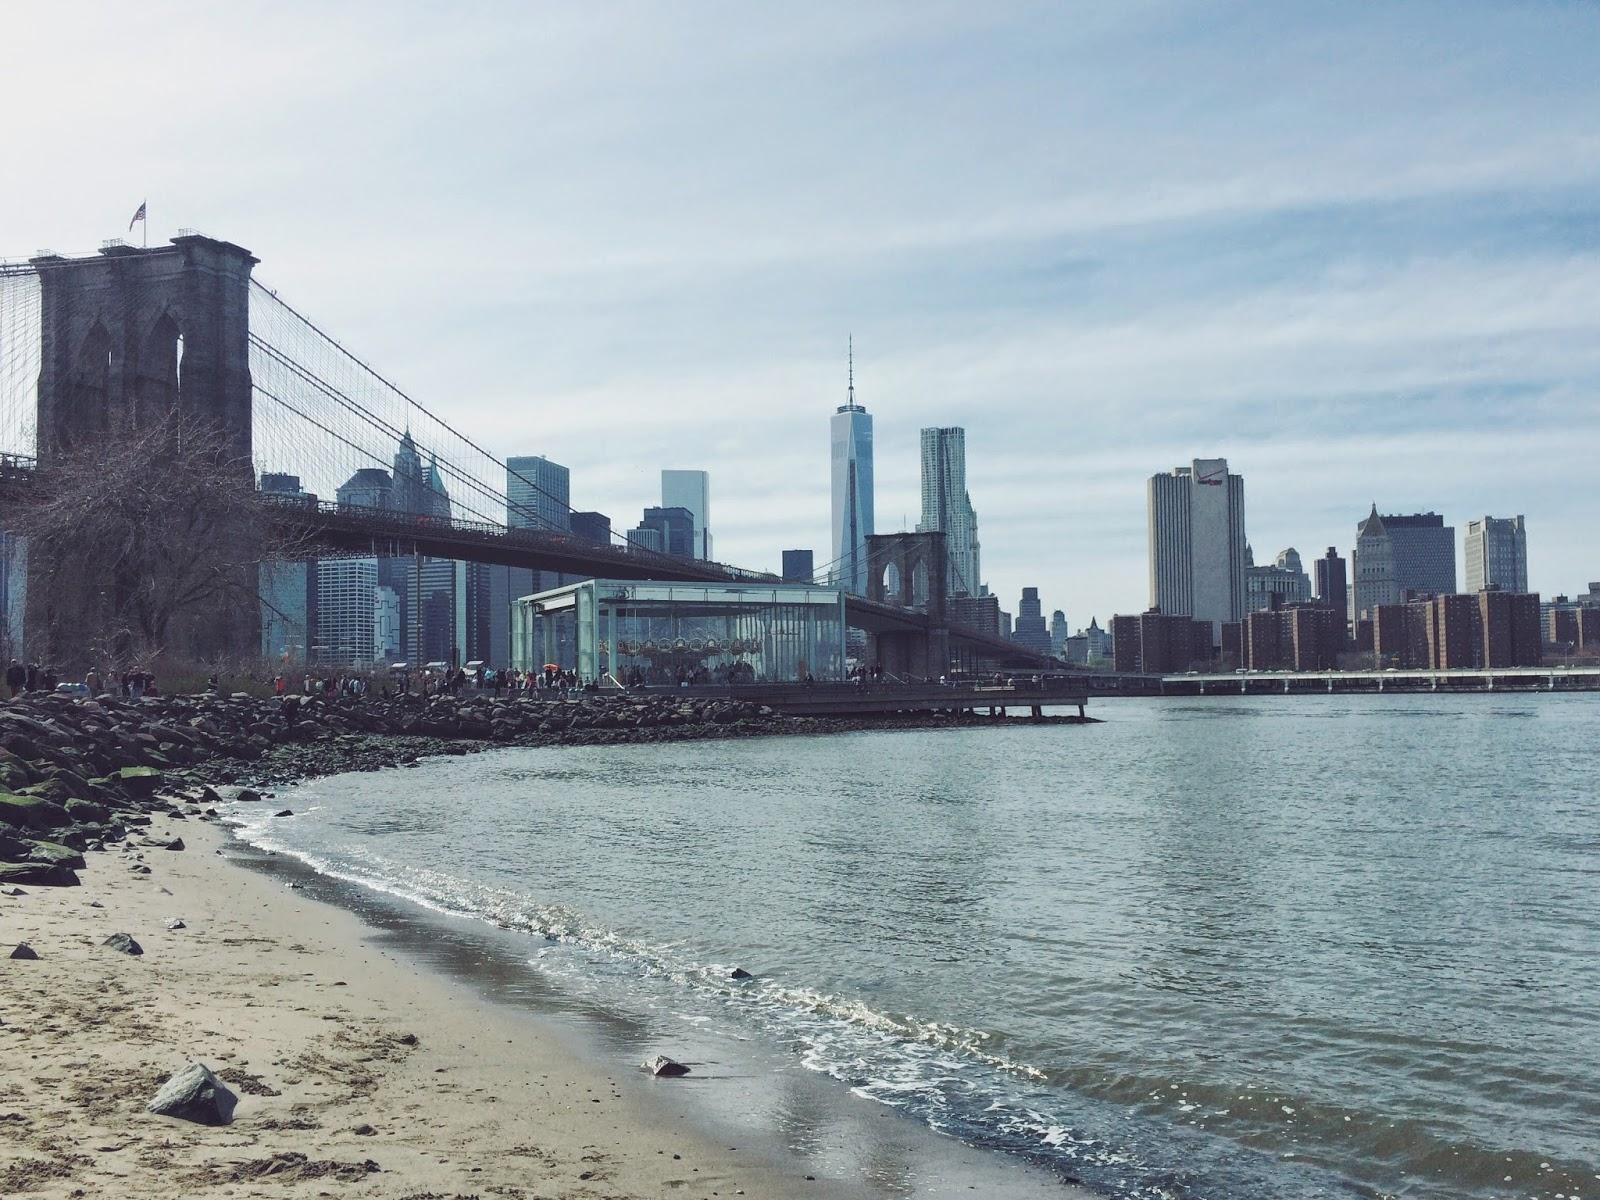 new york city voyage bonnes adresses programme idées lucileinwonderland blog lifestyle voyage NYC USA brooklyn manhattan